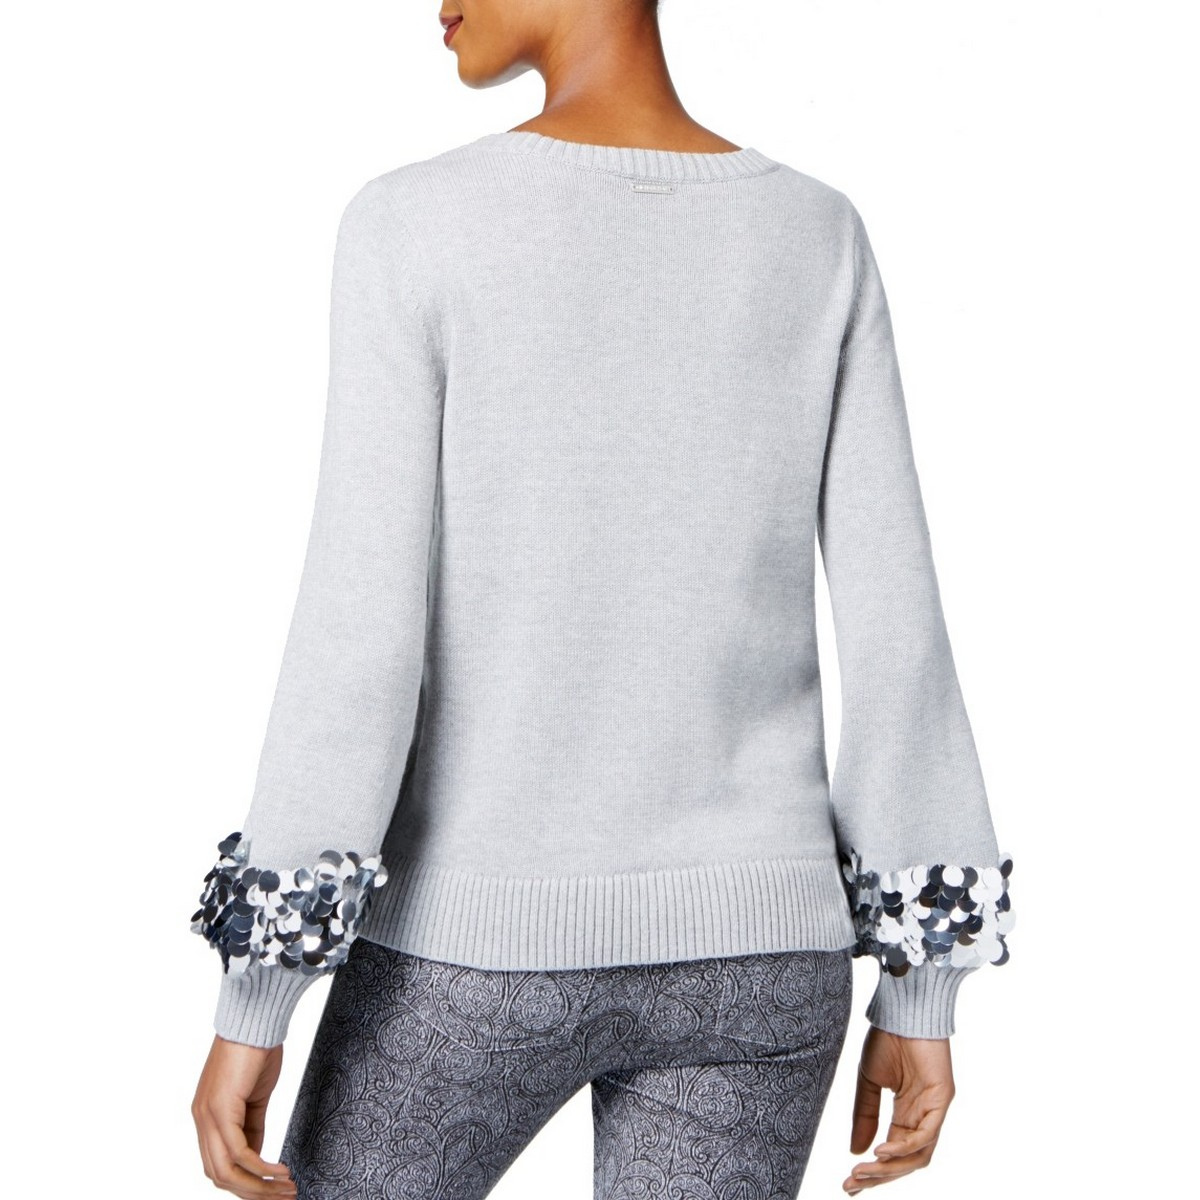 MICHAEL-KORS-NEW-Women-039-s-Cotton-Sequin-Cuff-Crewneck-Sweater-Top-TEDO thumbnail 6